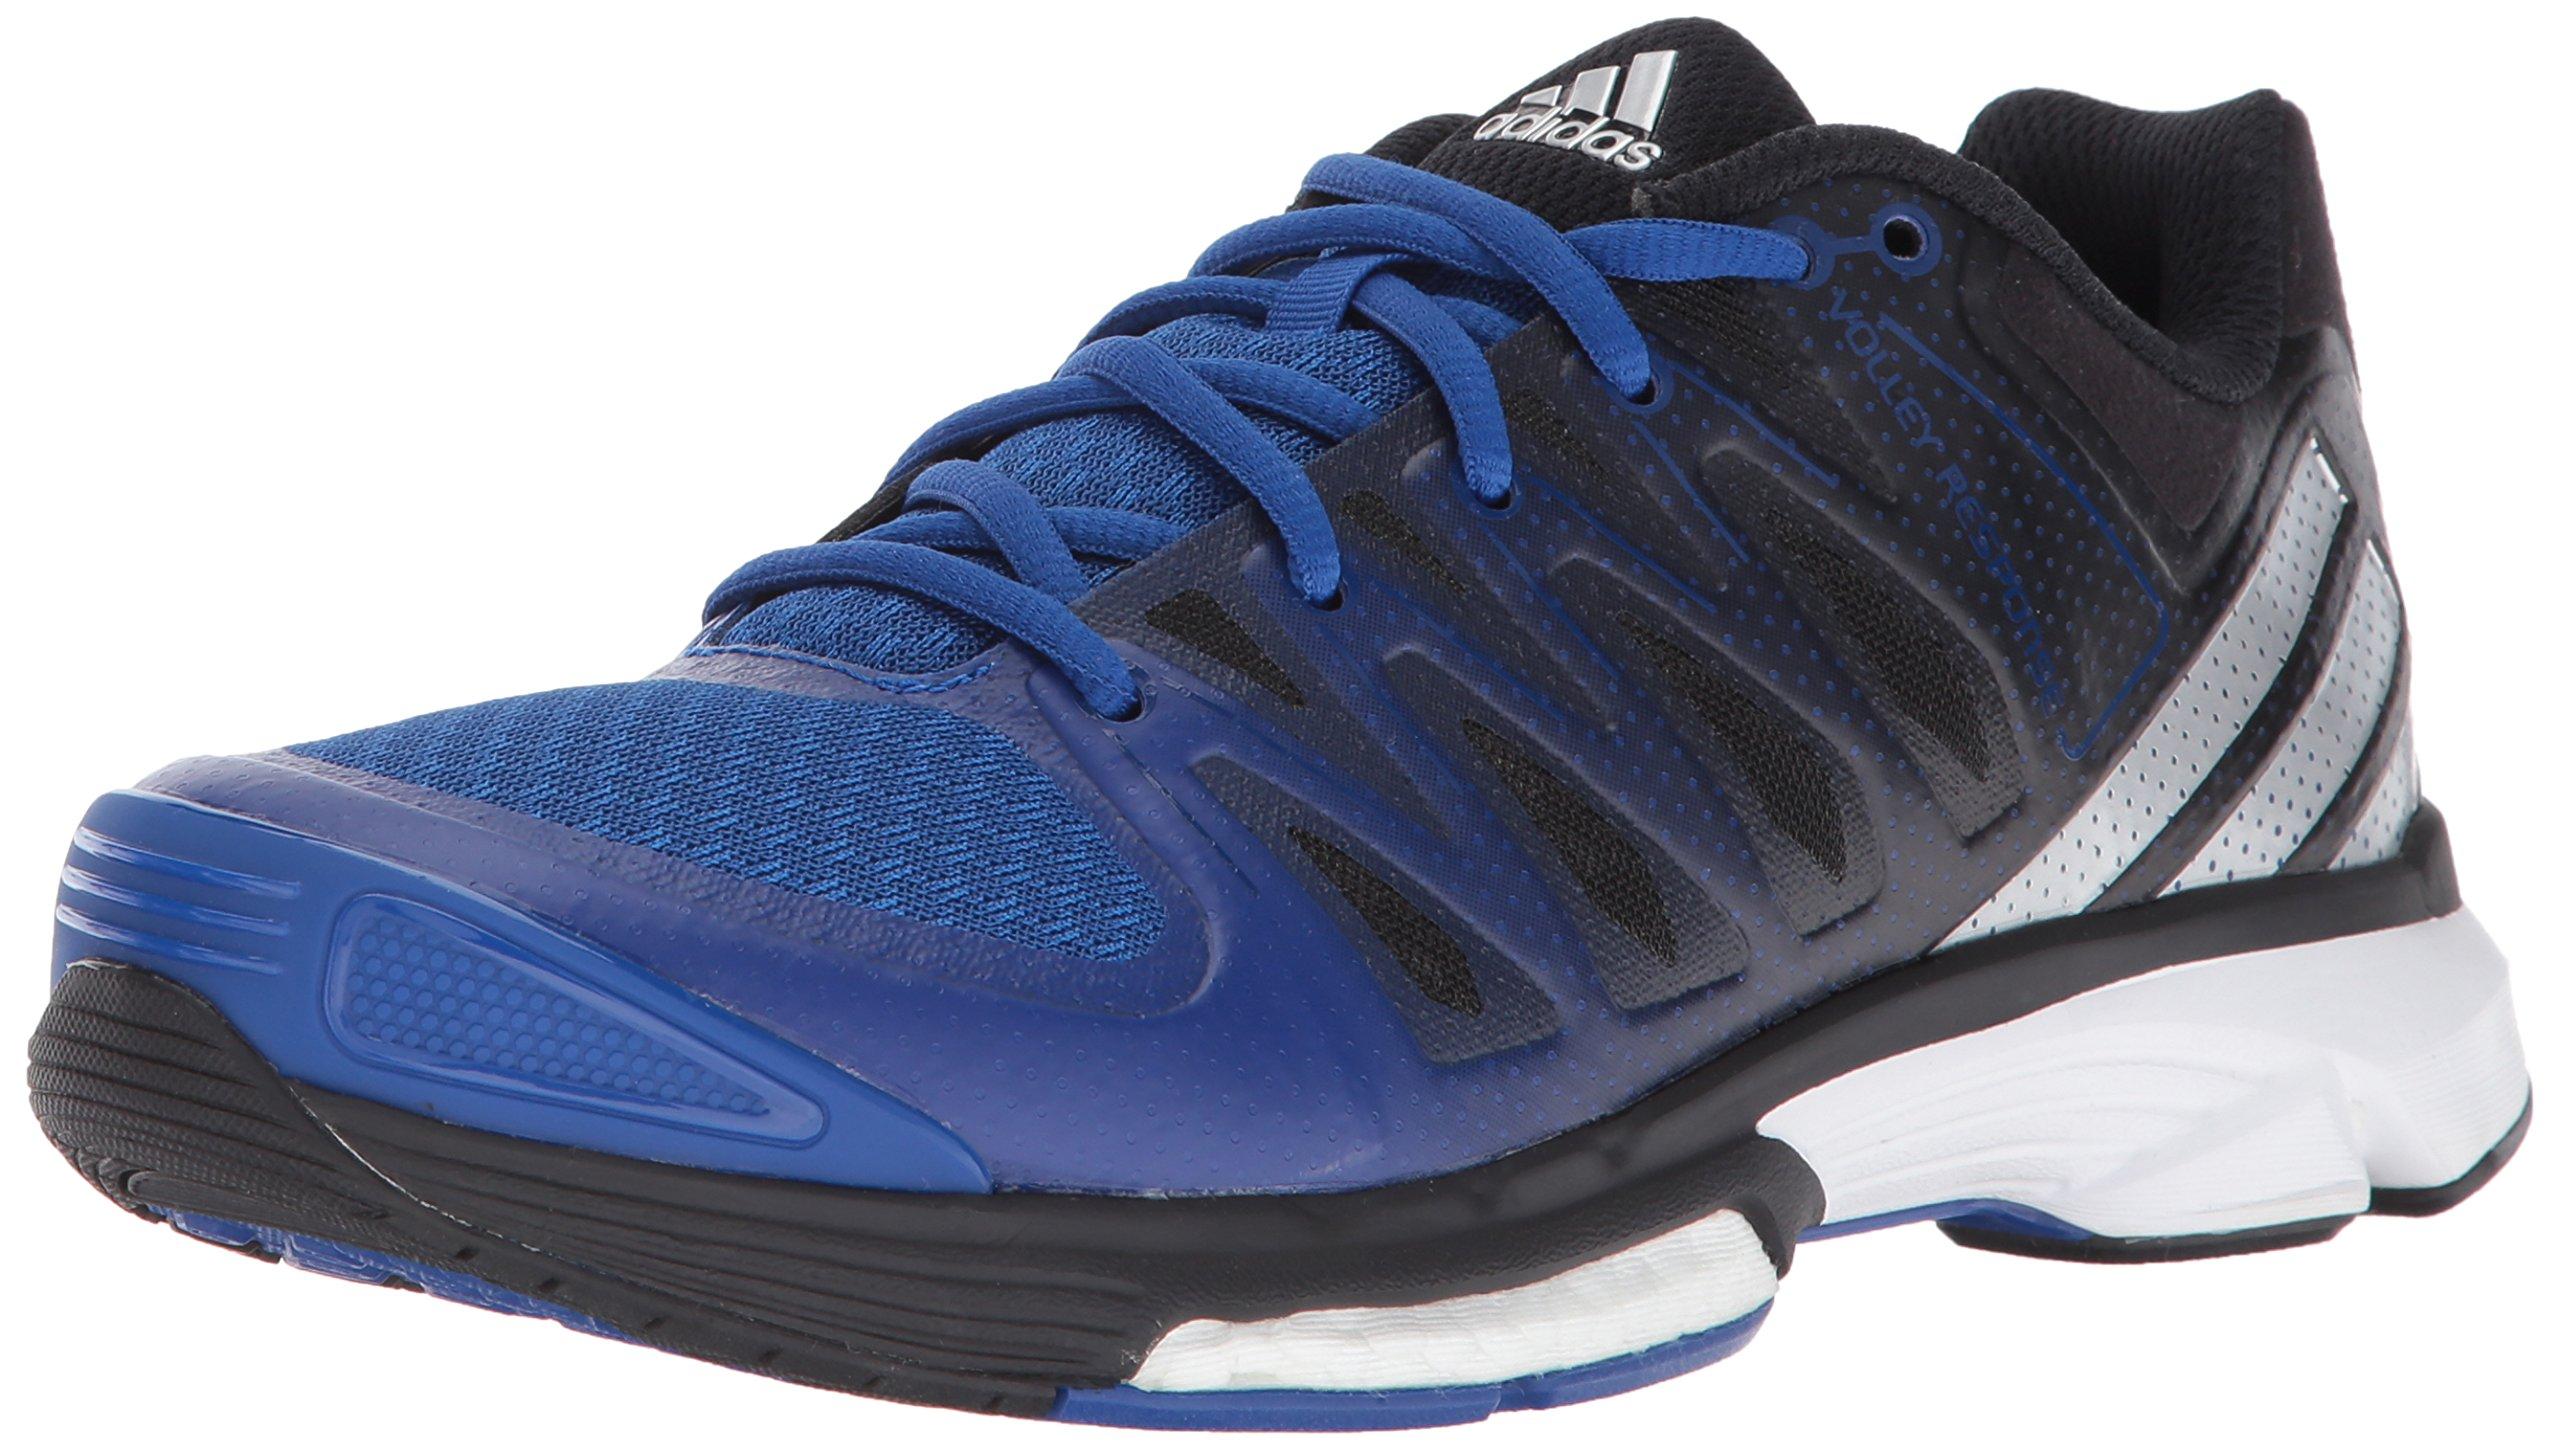 adidas Women's Volley Response 2 Boost W Shoe, Collegiate Royal/Metallic Silver/Black, 6.5 M US